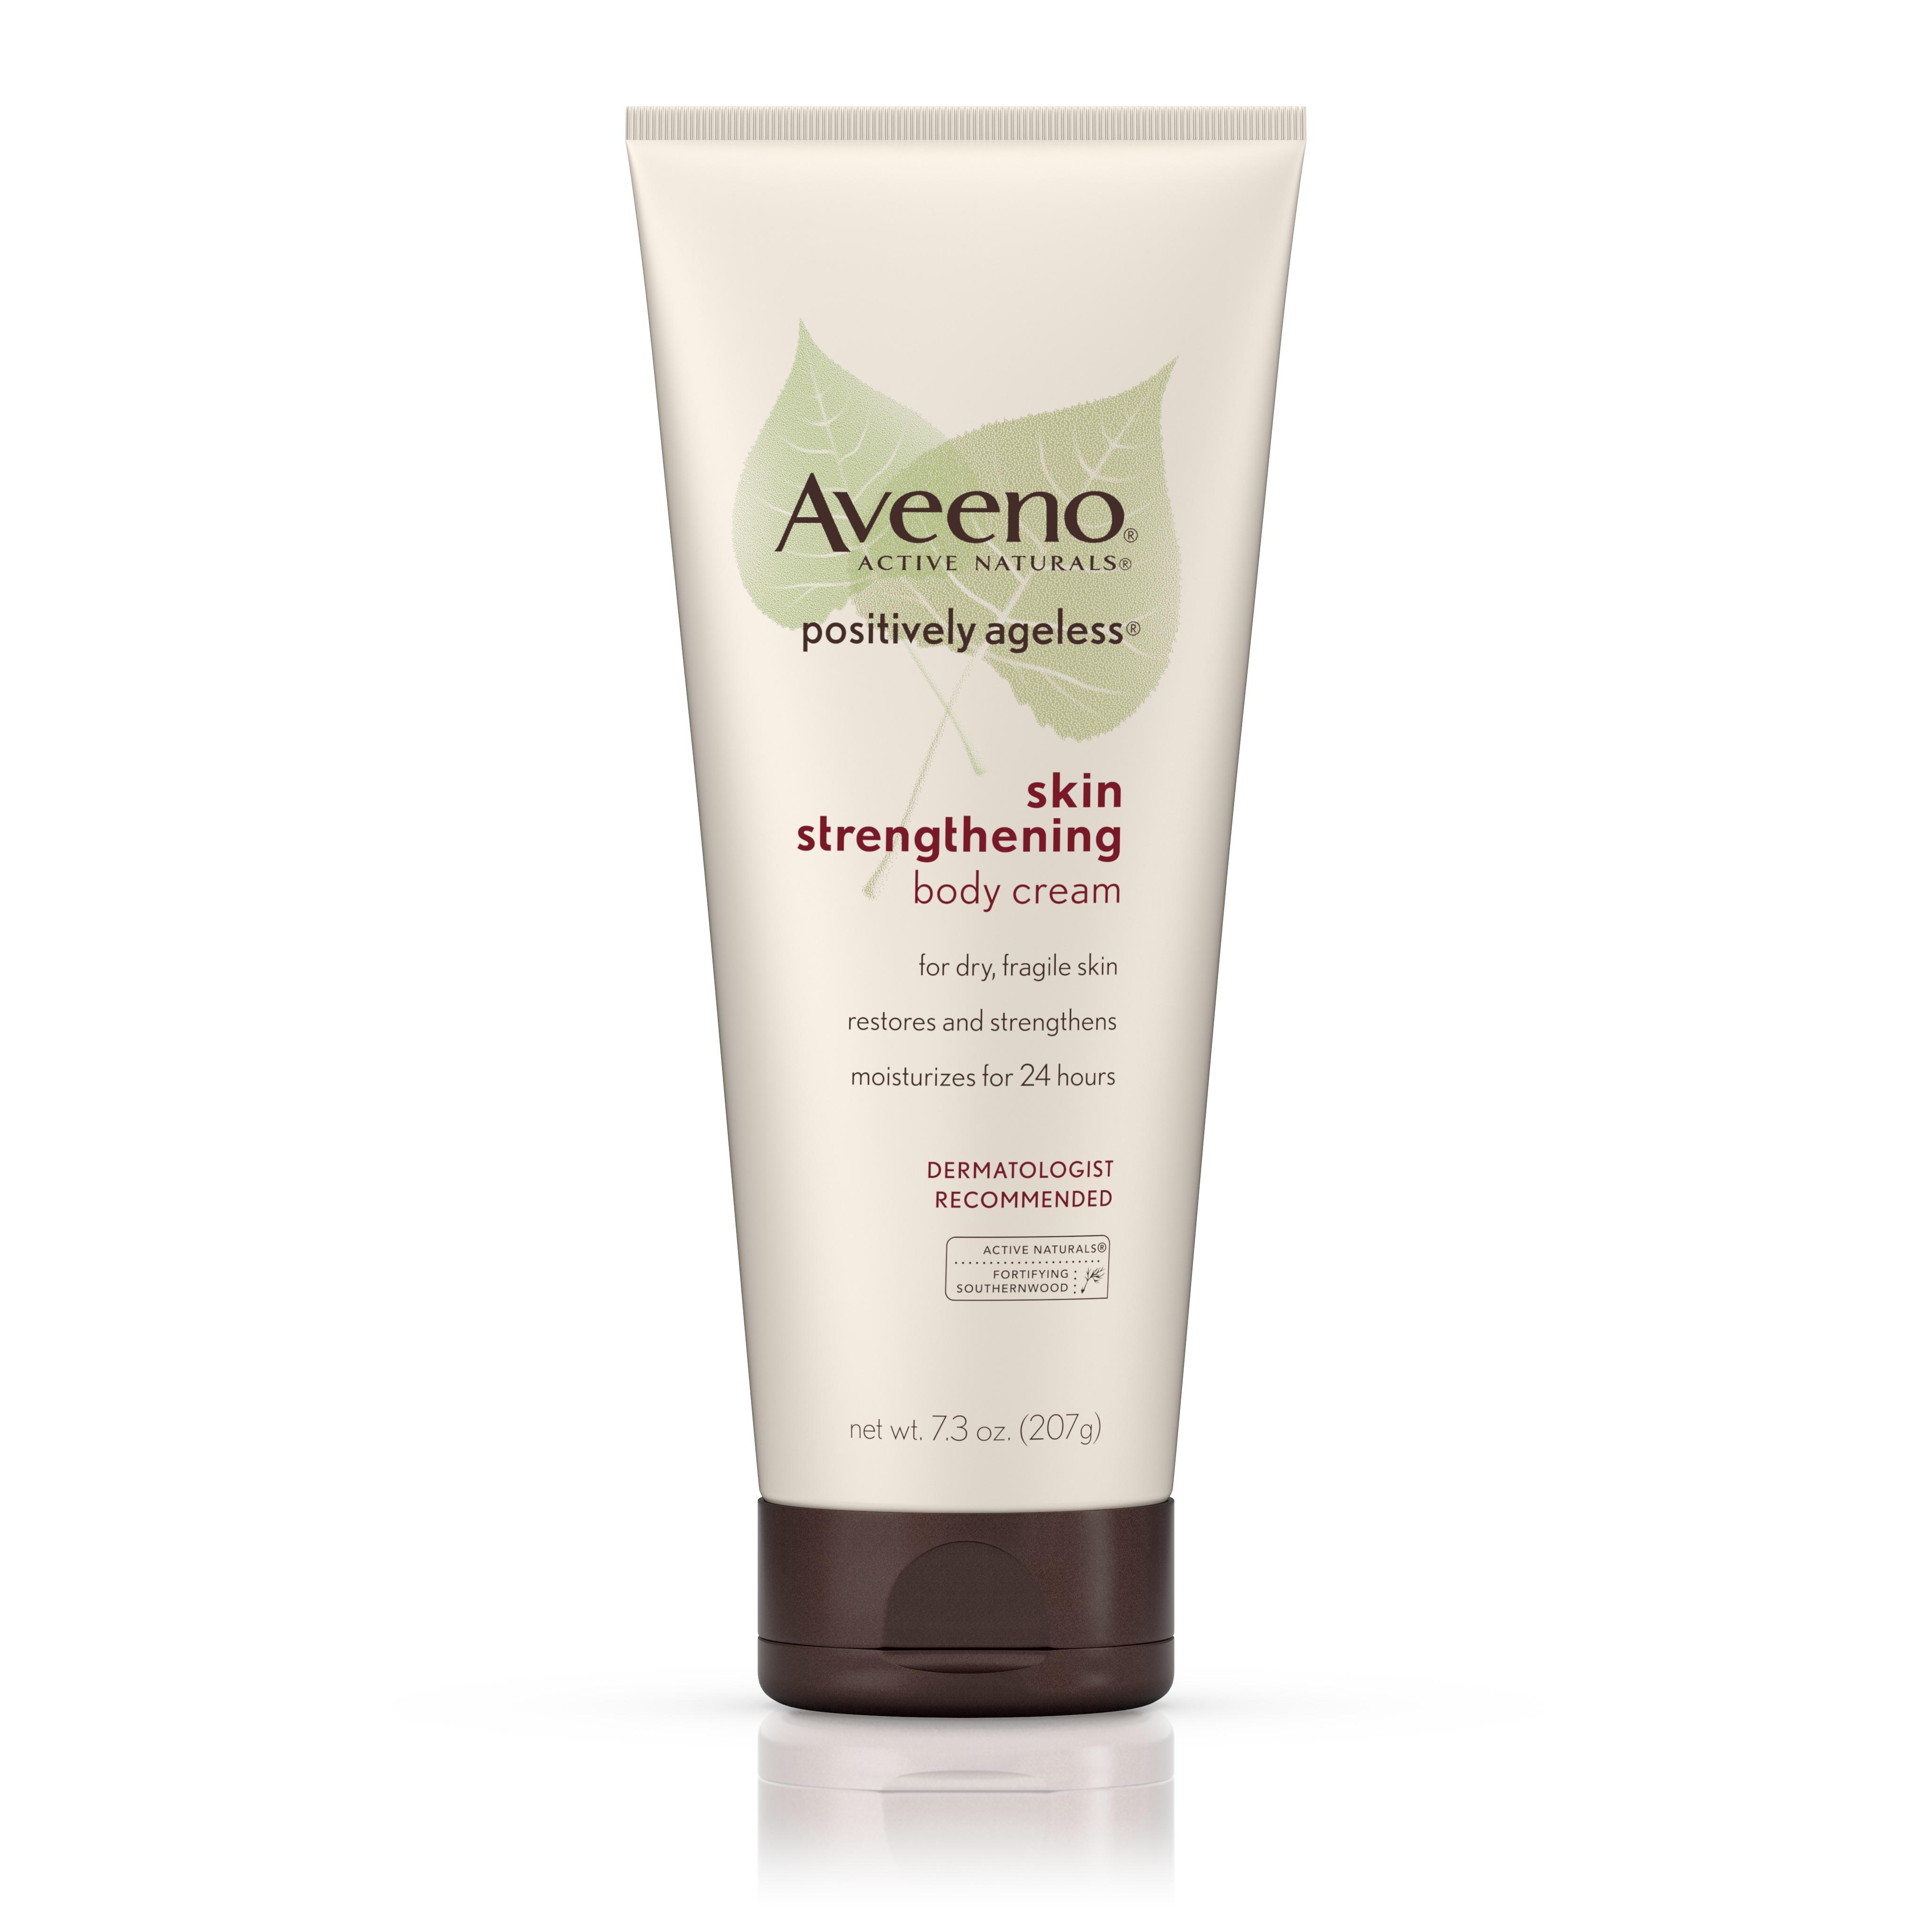 Aveeno Positively Ageless Skin Strengthening Body Cream, Moisturizes For 24 Hours 7.3 Oz by Generic